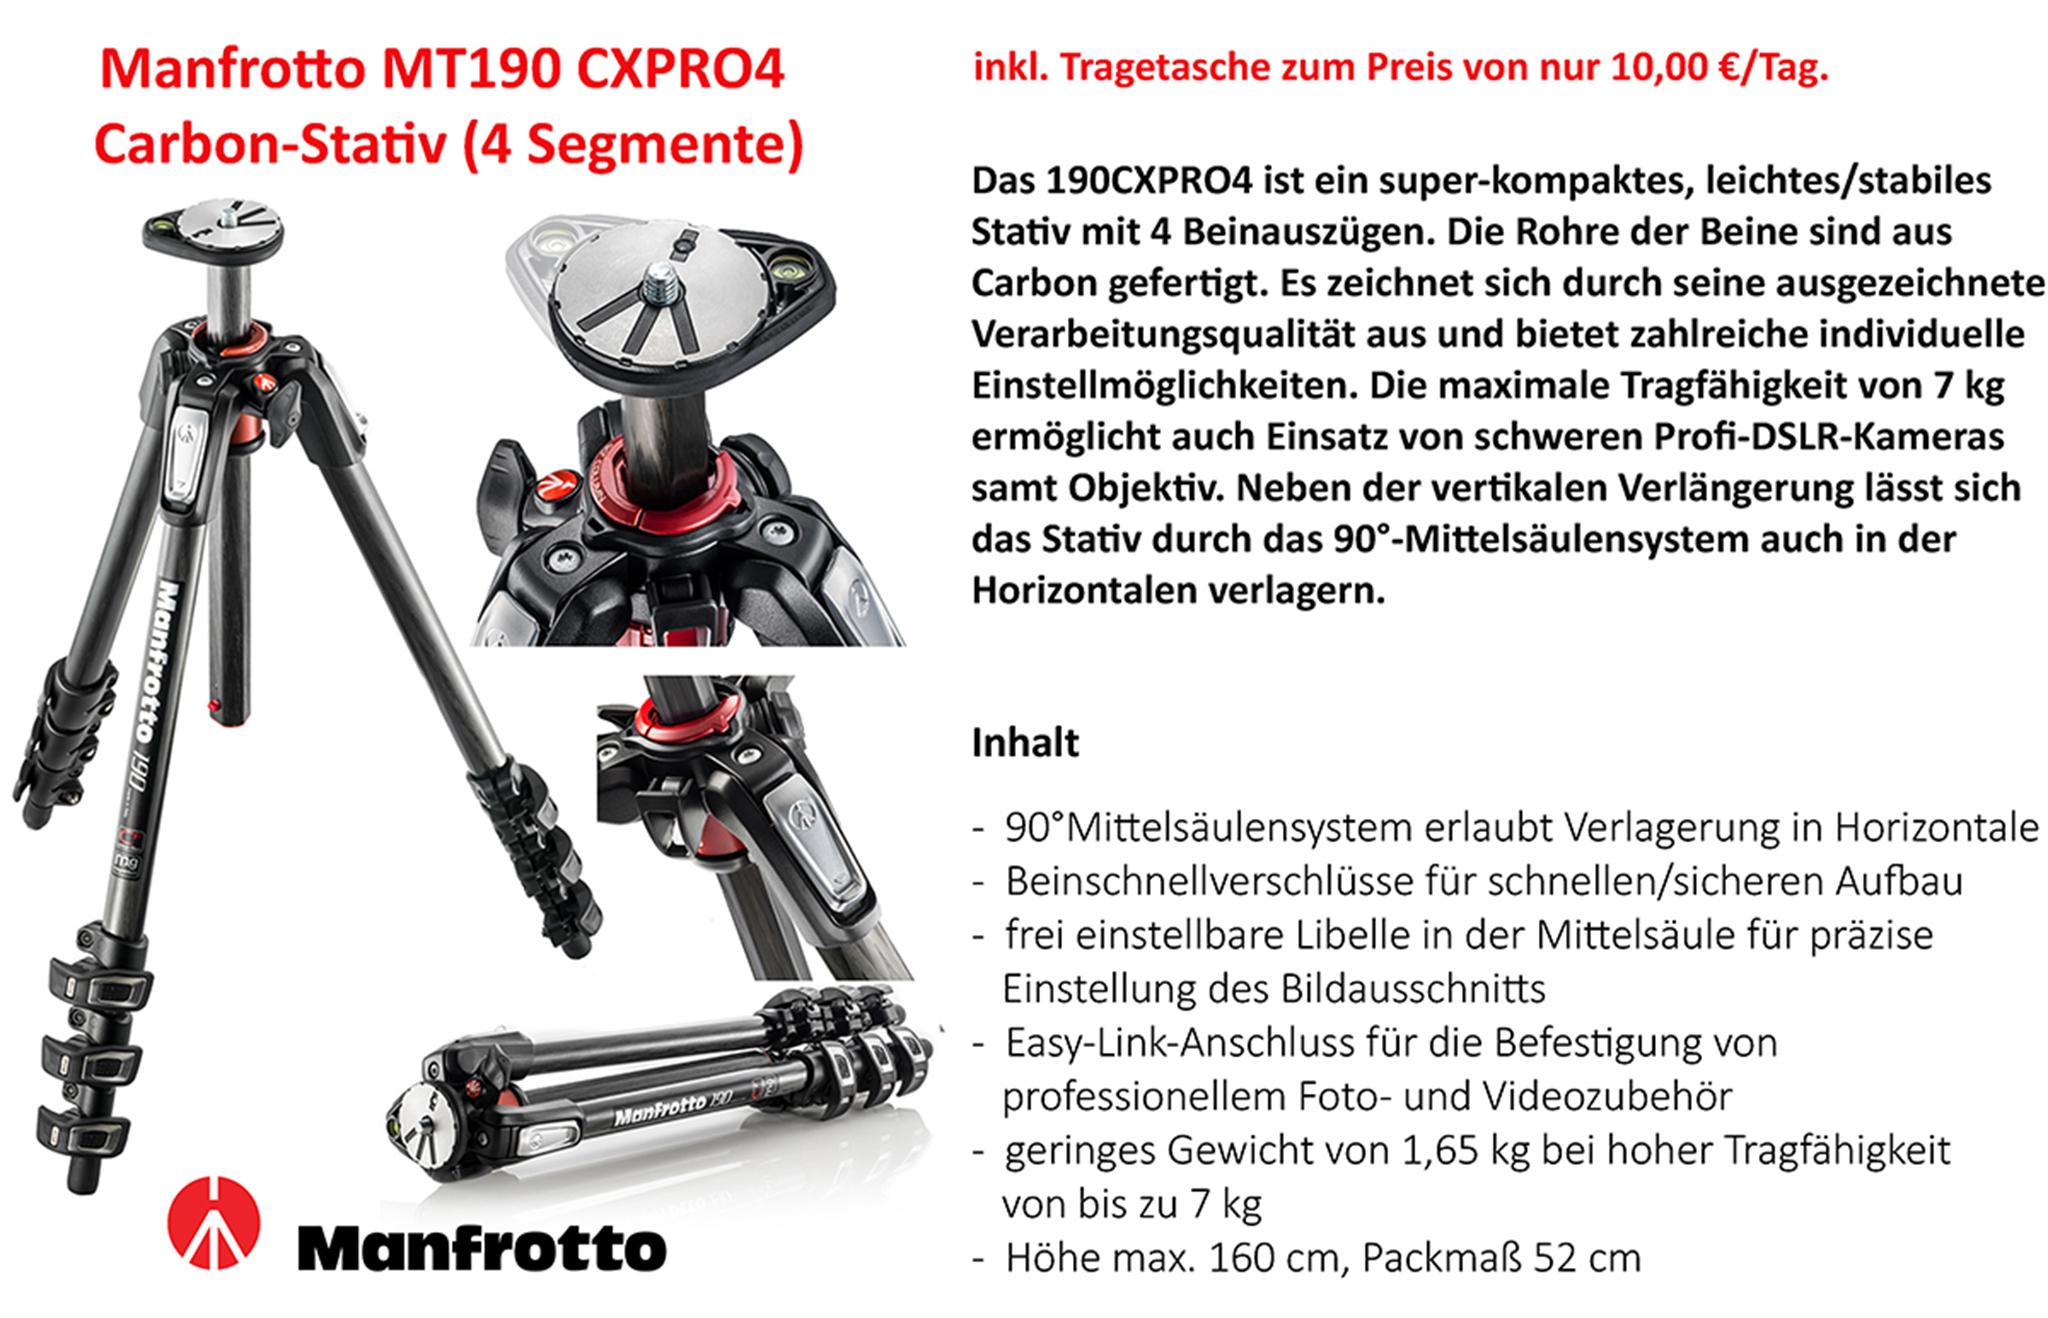 Manfrotto MT190XPRO4 Stativ - Andrea Ludwig Design Ihr ...